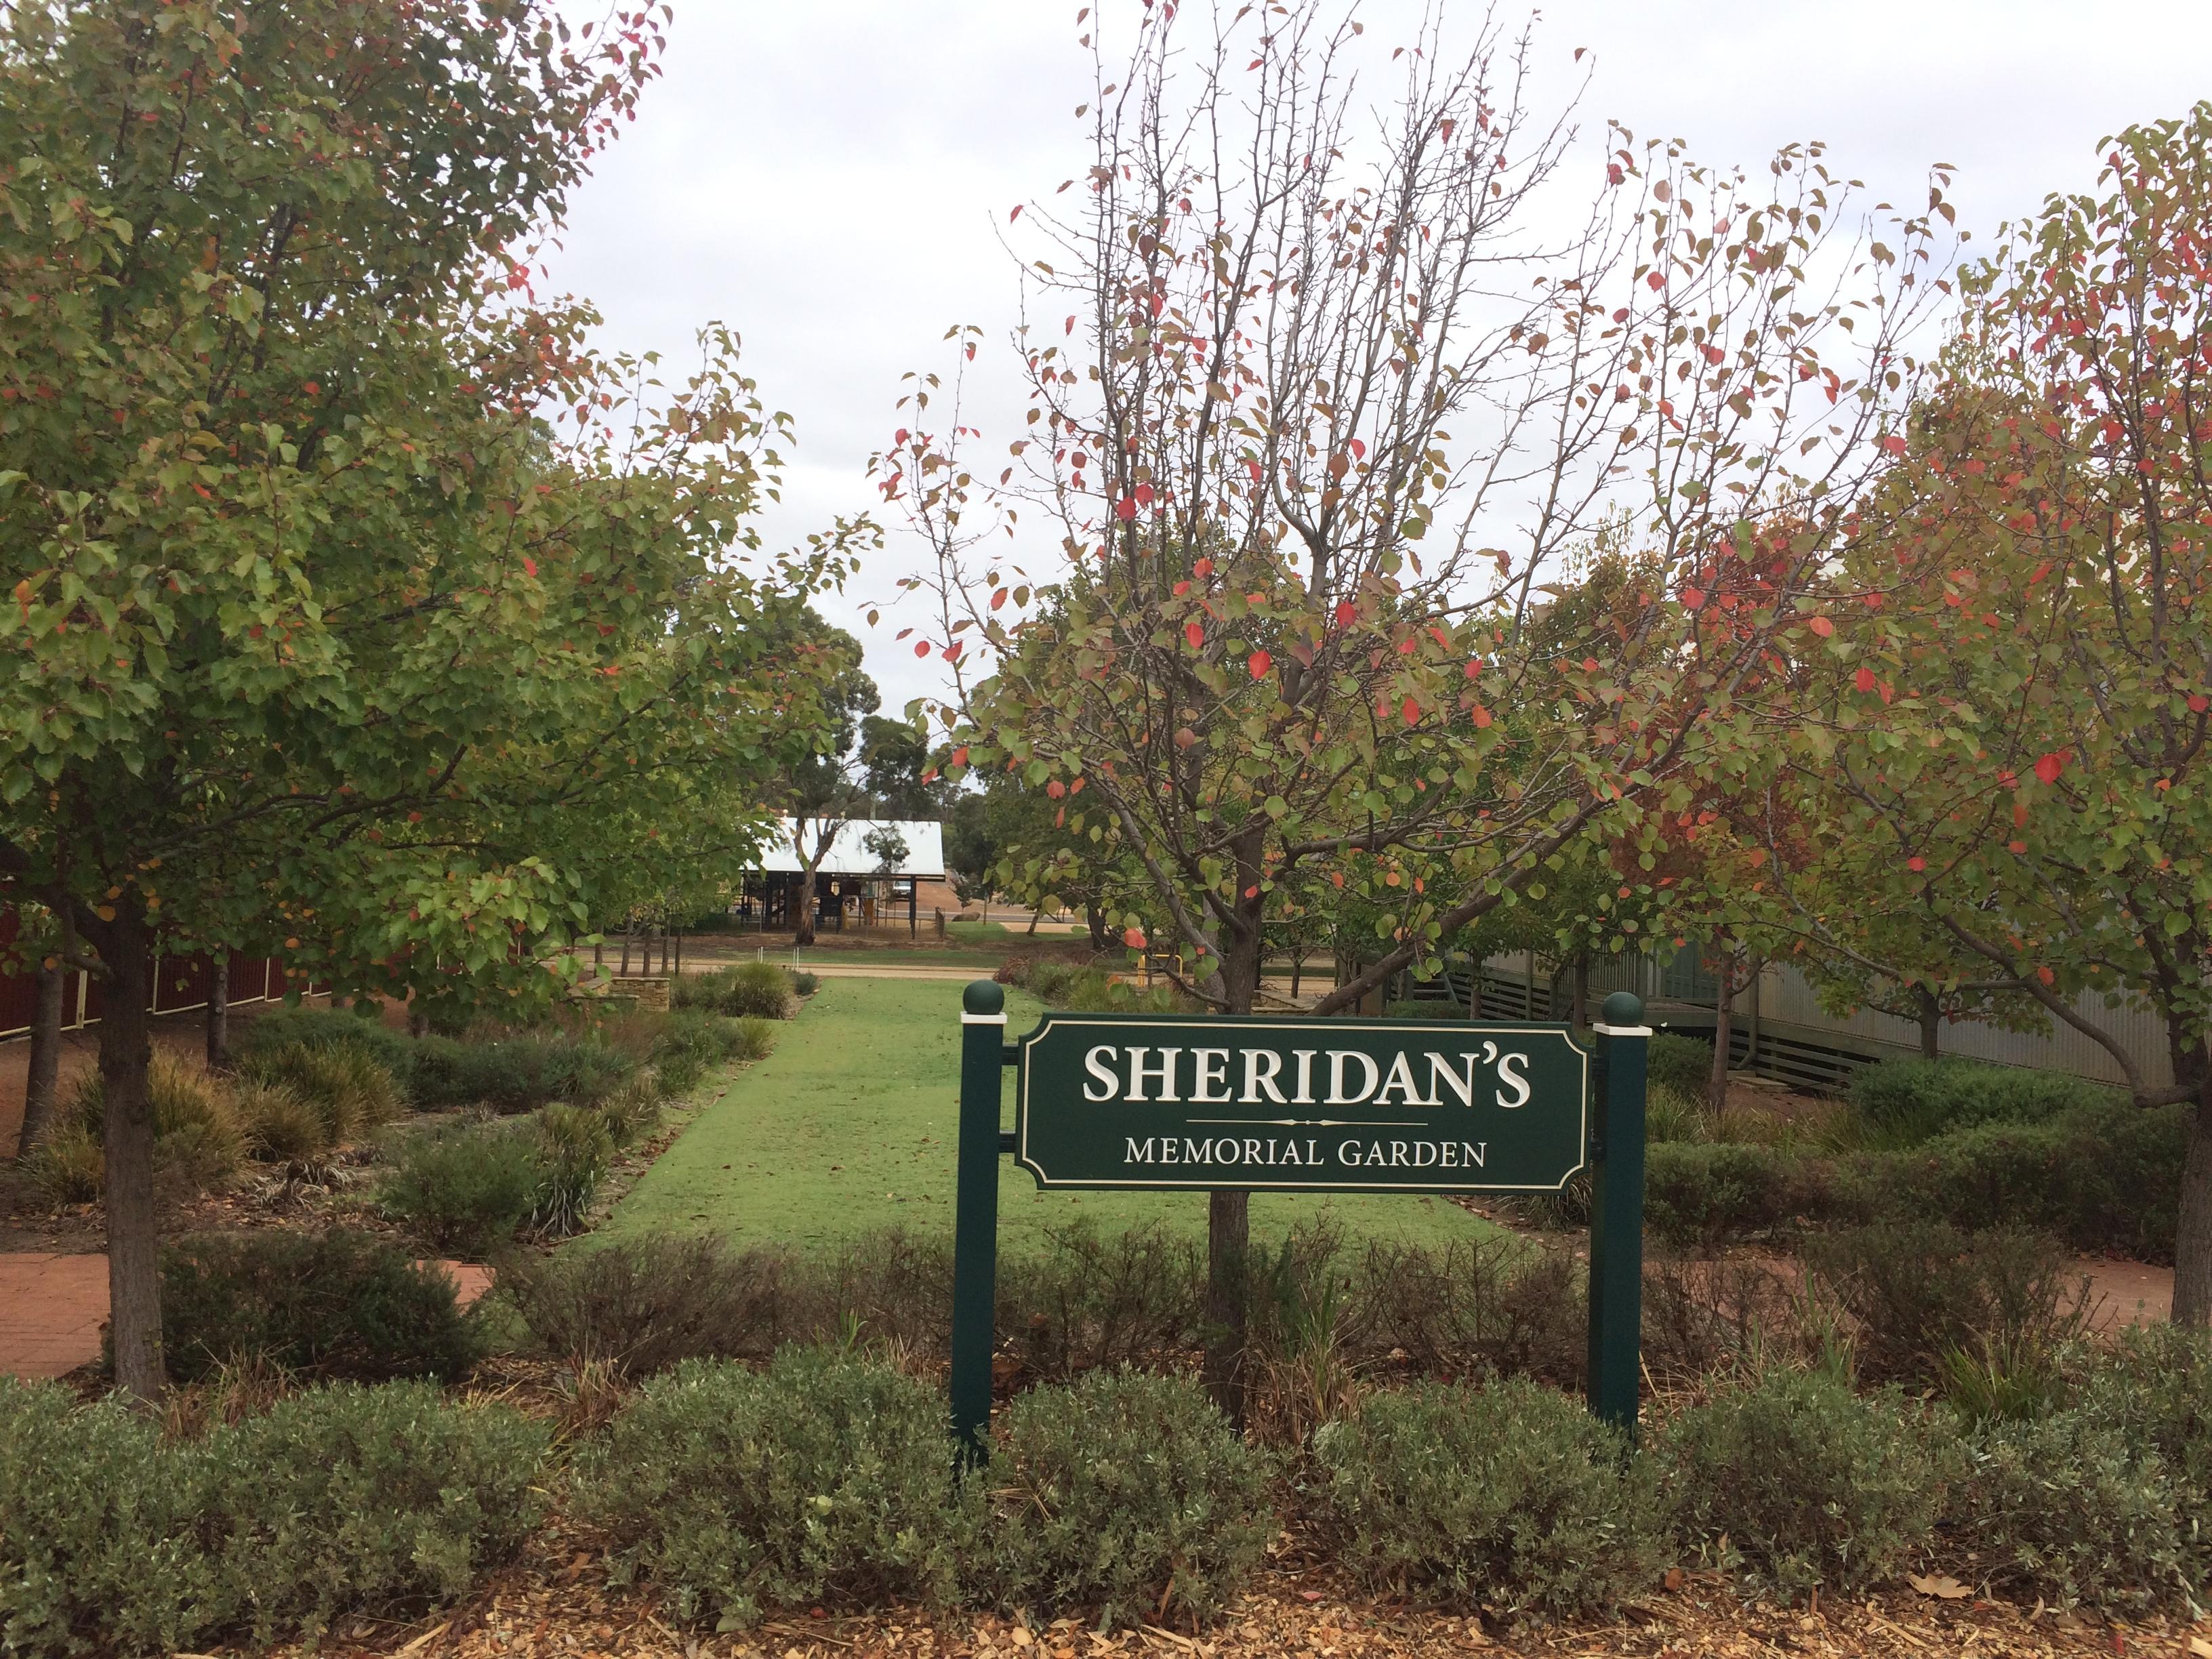 Attractive Memorial Gardens Sheridan Obituaries Mold - Brown Nature ...